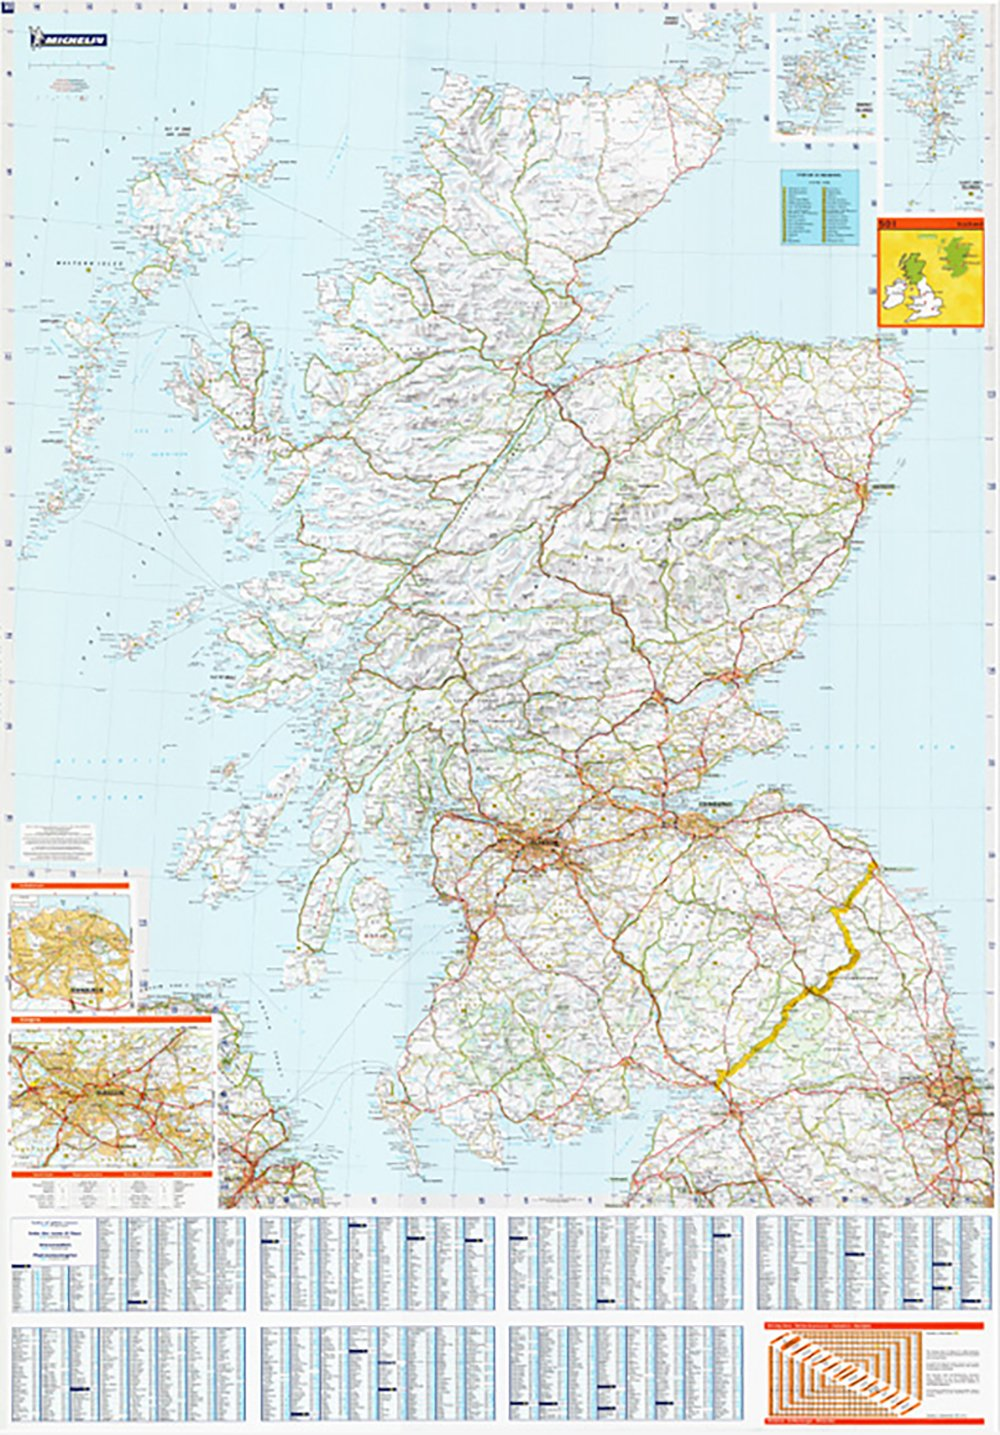 large laminated wall map of scotland by michelin amazon co uk